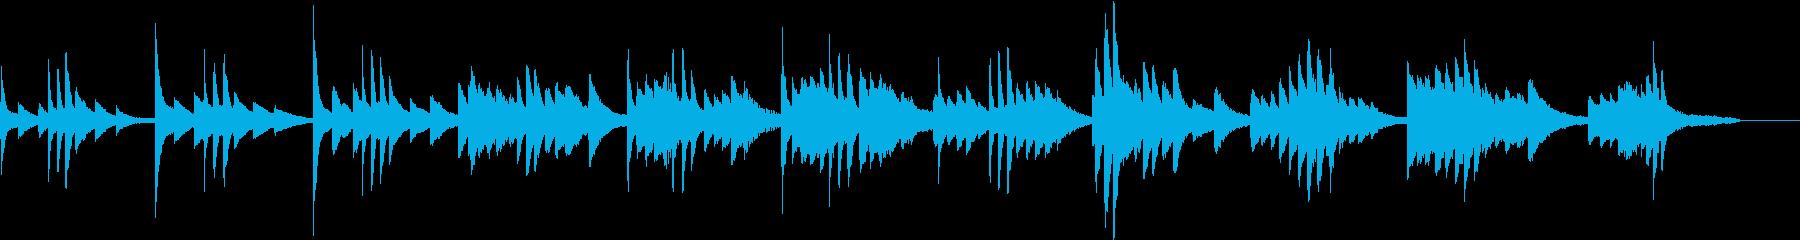 BGM用寂しいピアノの再生済みの波形